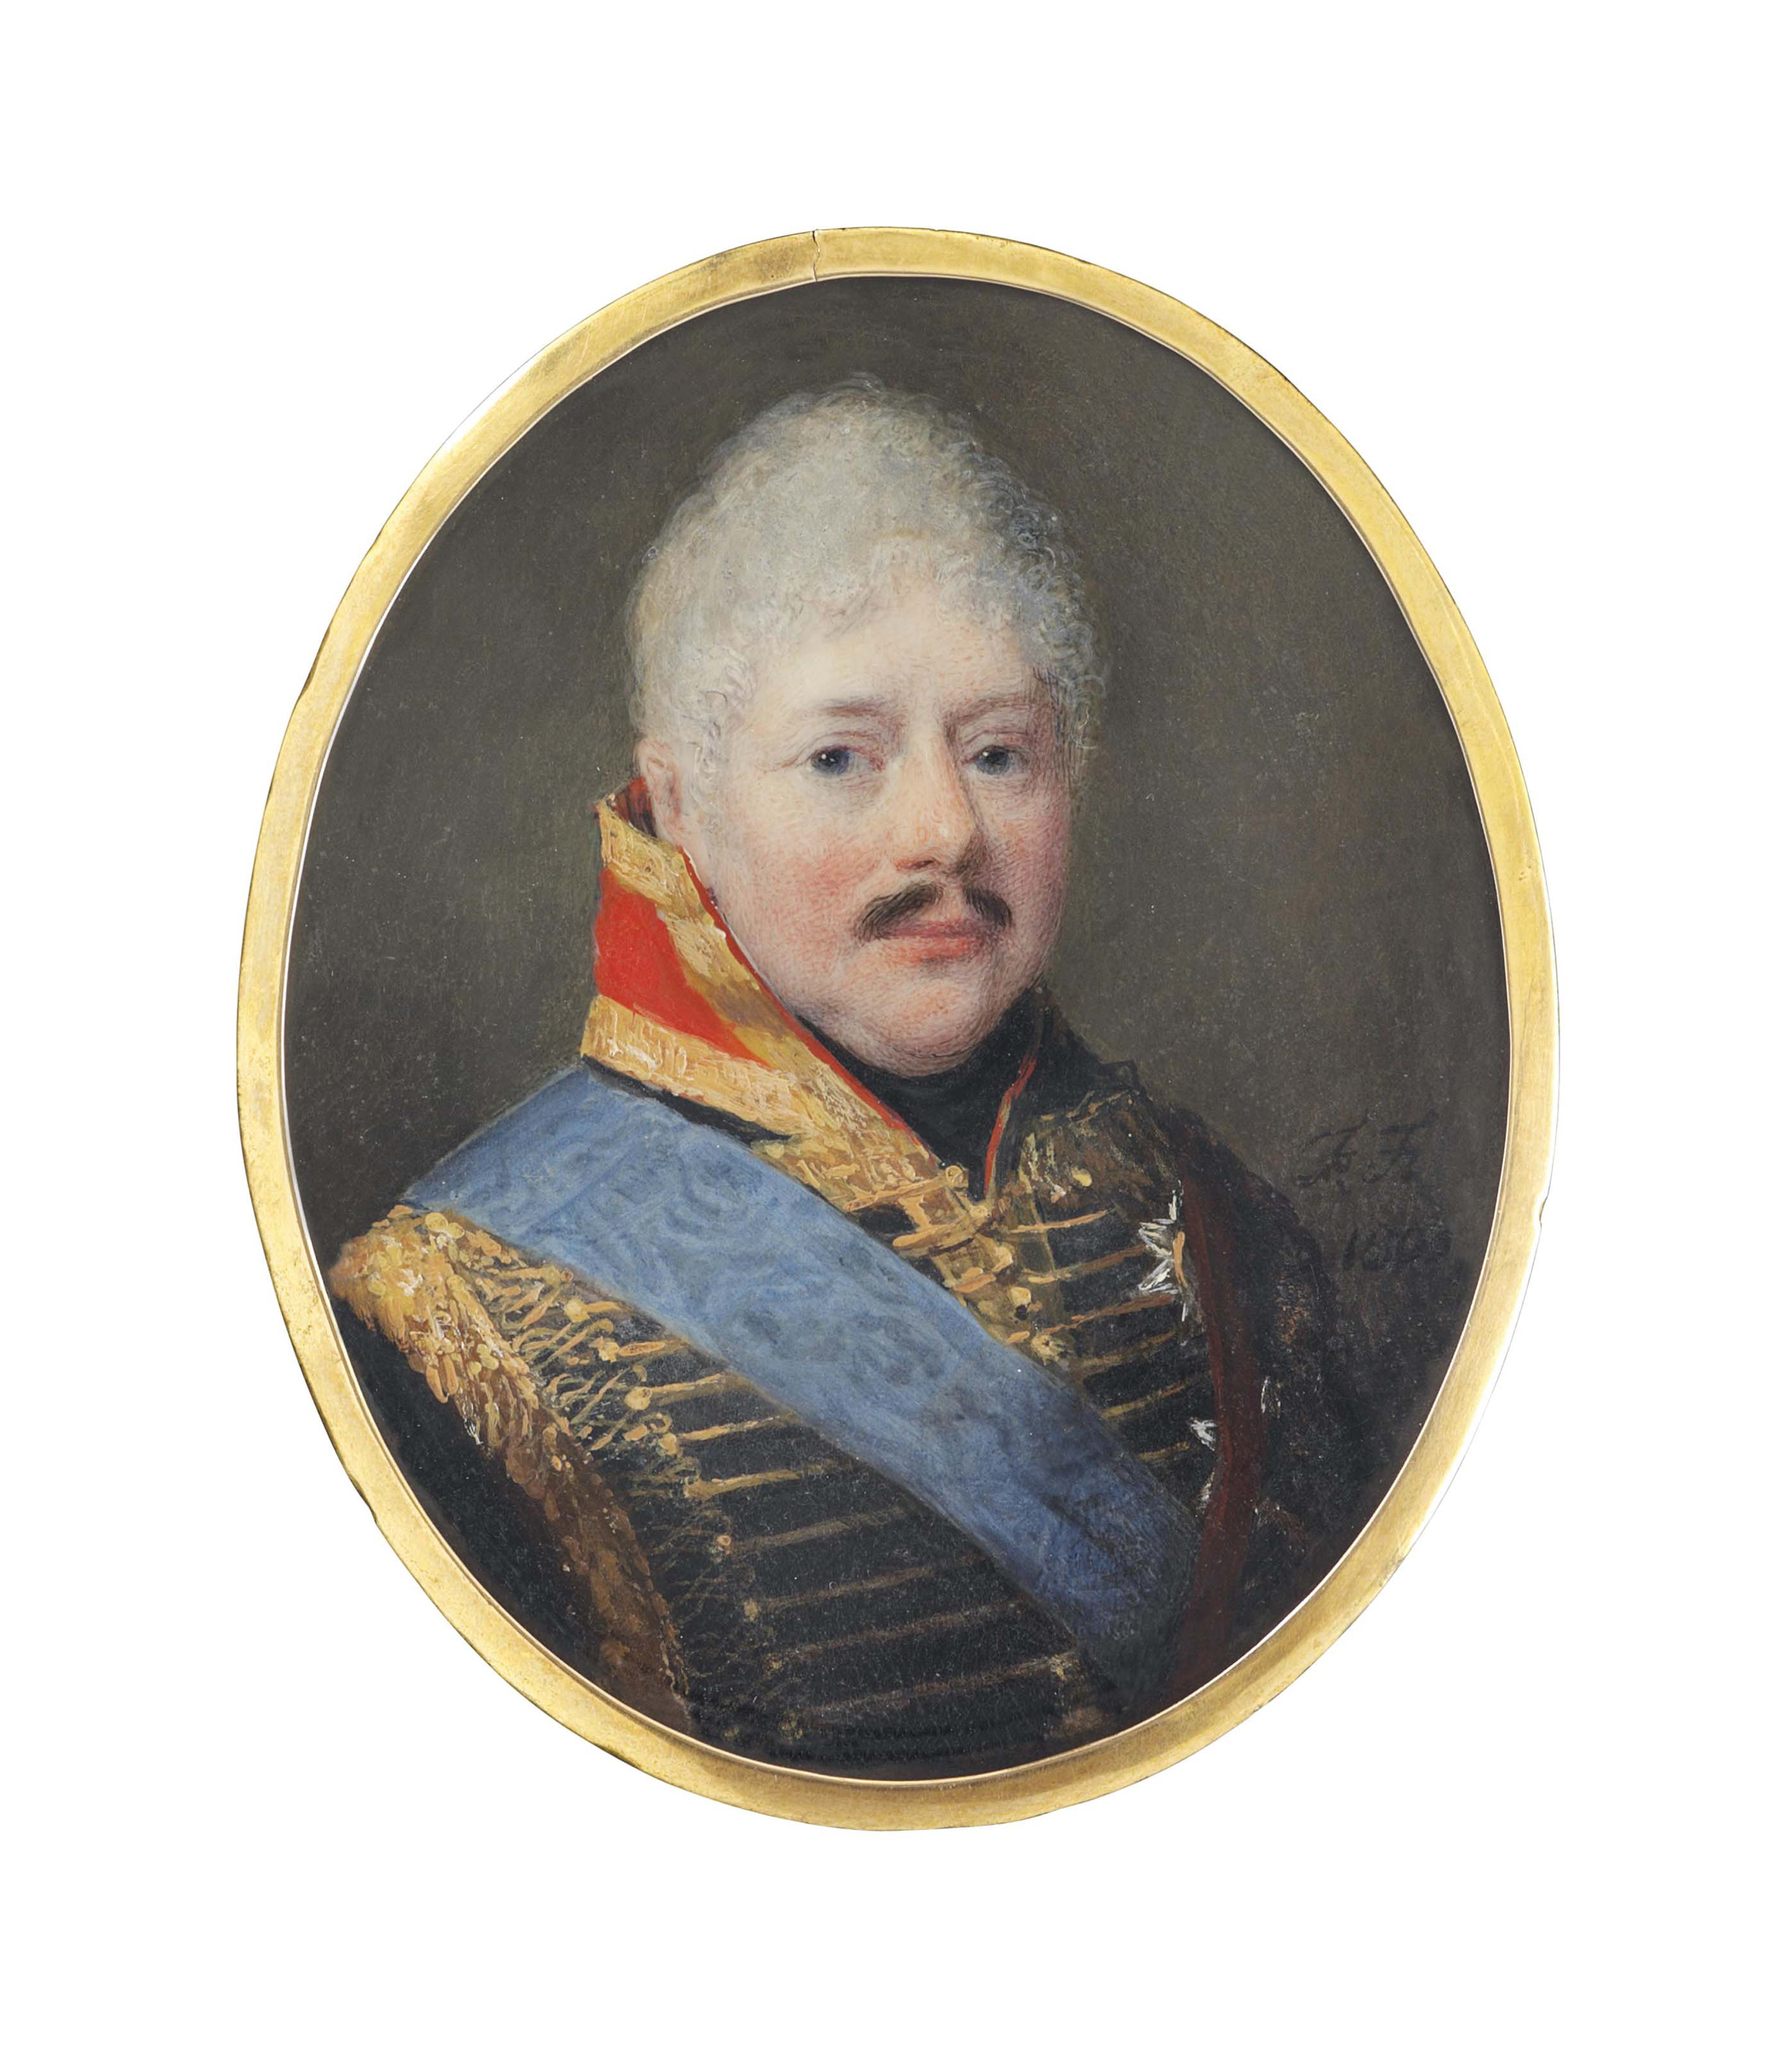 FRANÇOIS FERRIÈRE (SWISS, 1752-1839)